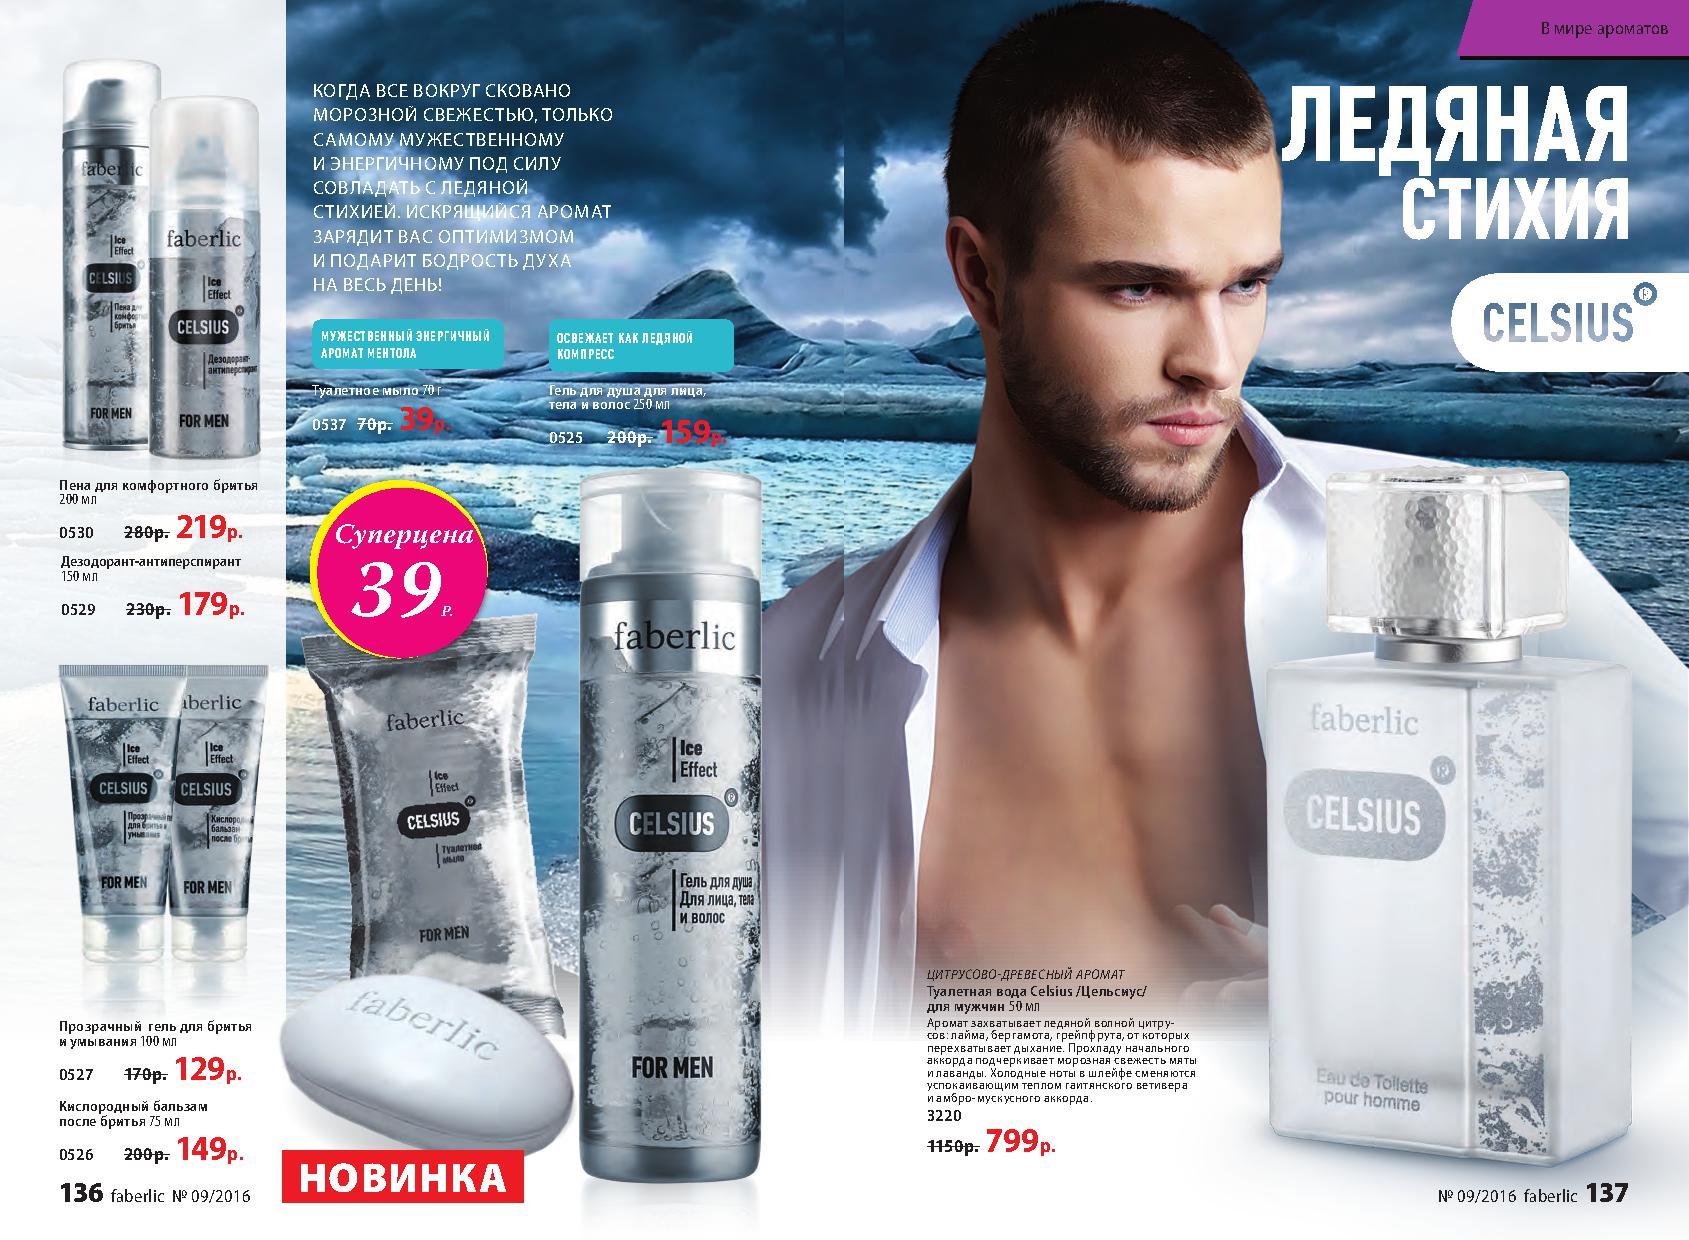 http://www.faberlic-fl.ru/novaya/katalogS/faberlic/assortiment-faberlic_136.jpg